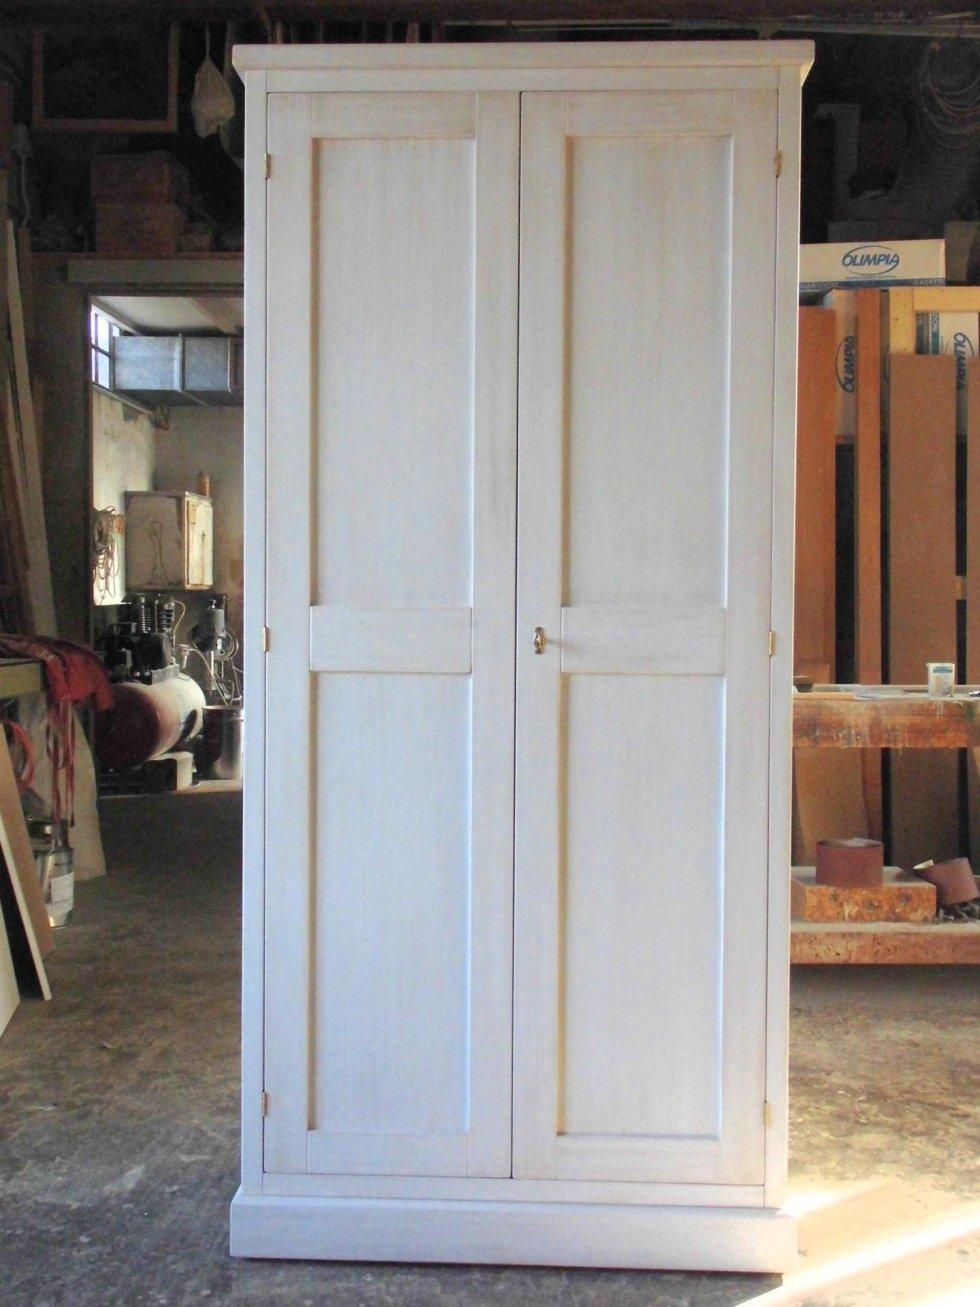 porta in legno in una falegnameria